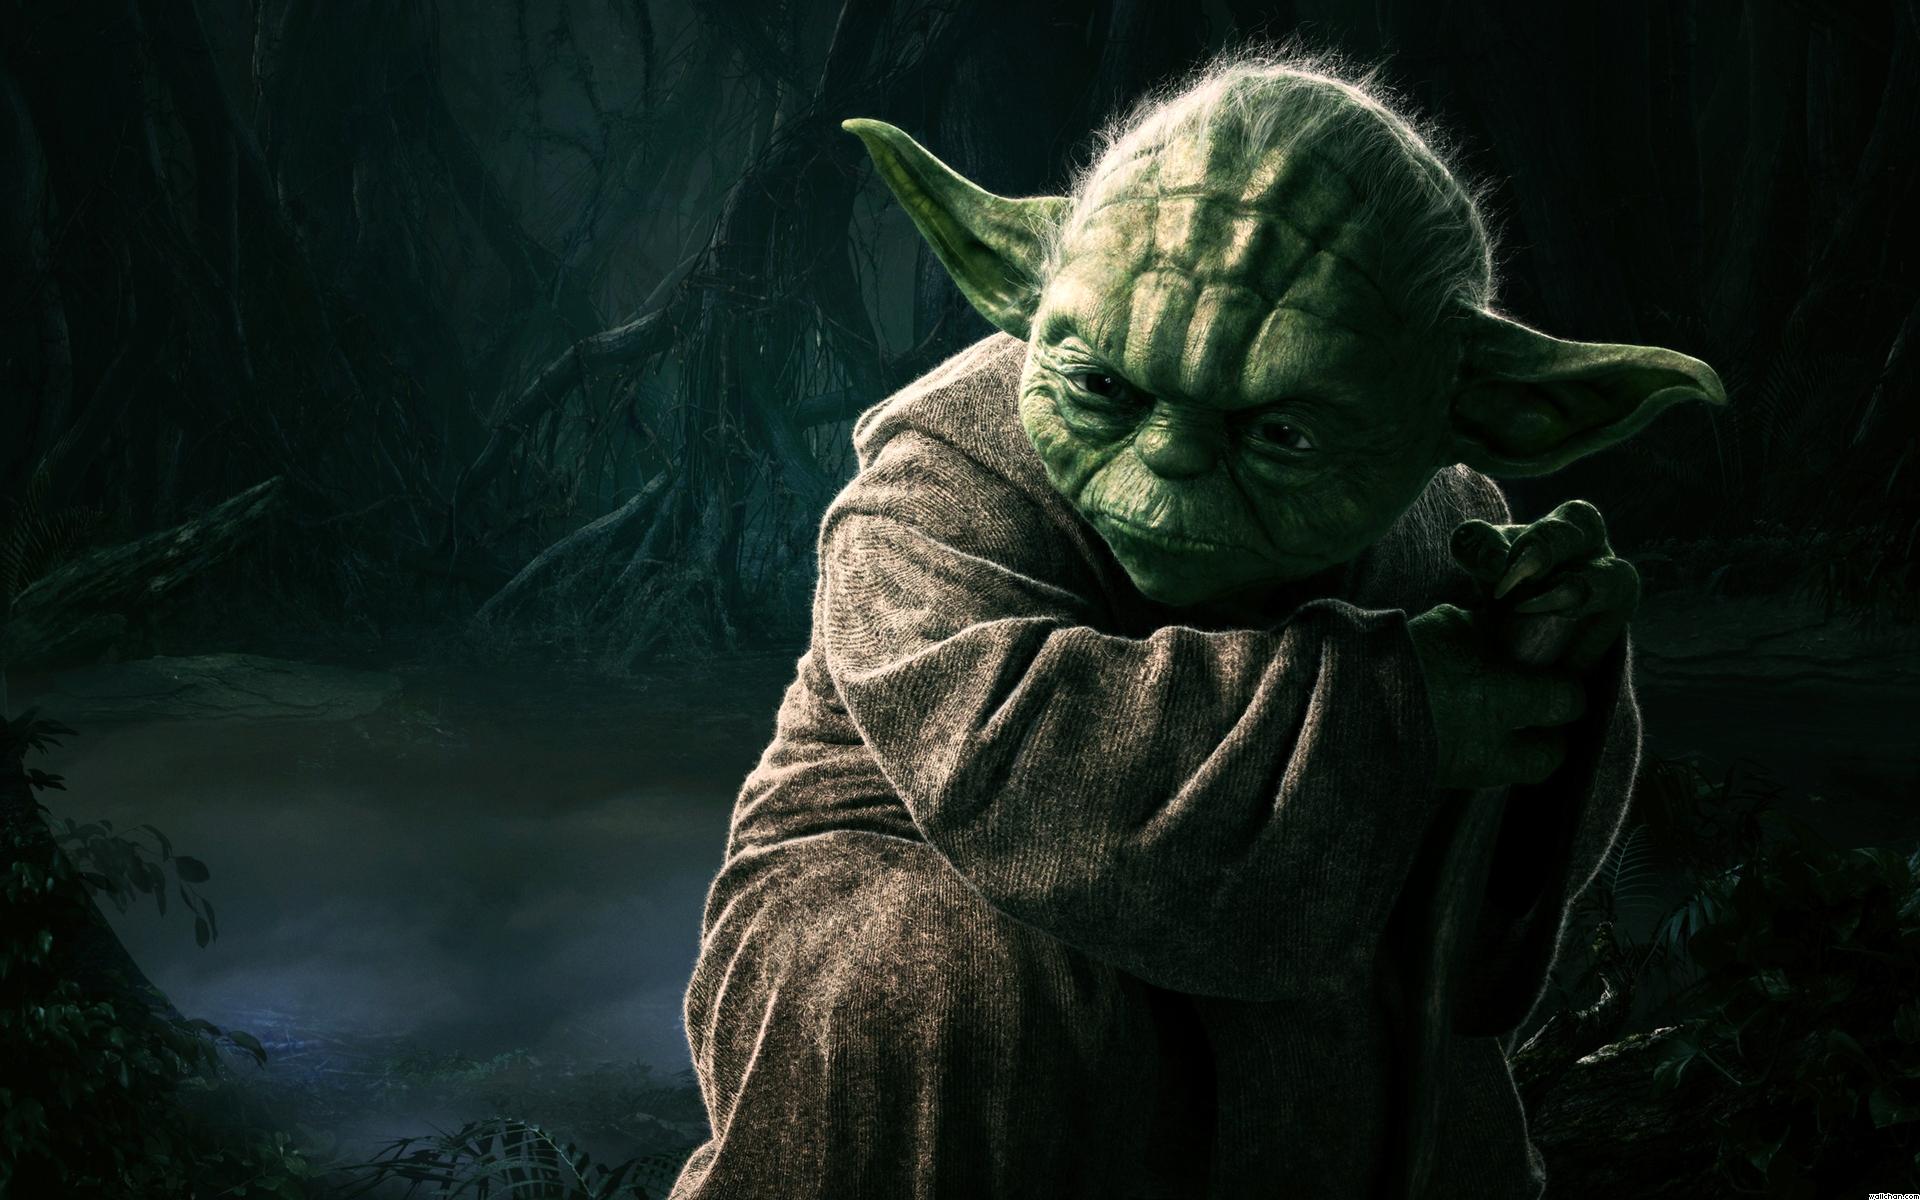 Yoda Star Wars Exclusive HD Wallpapers 1592 1920x1200